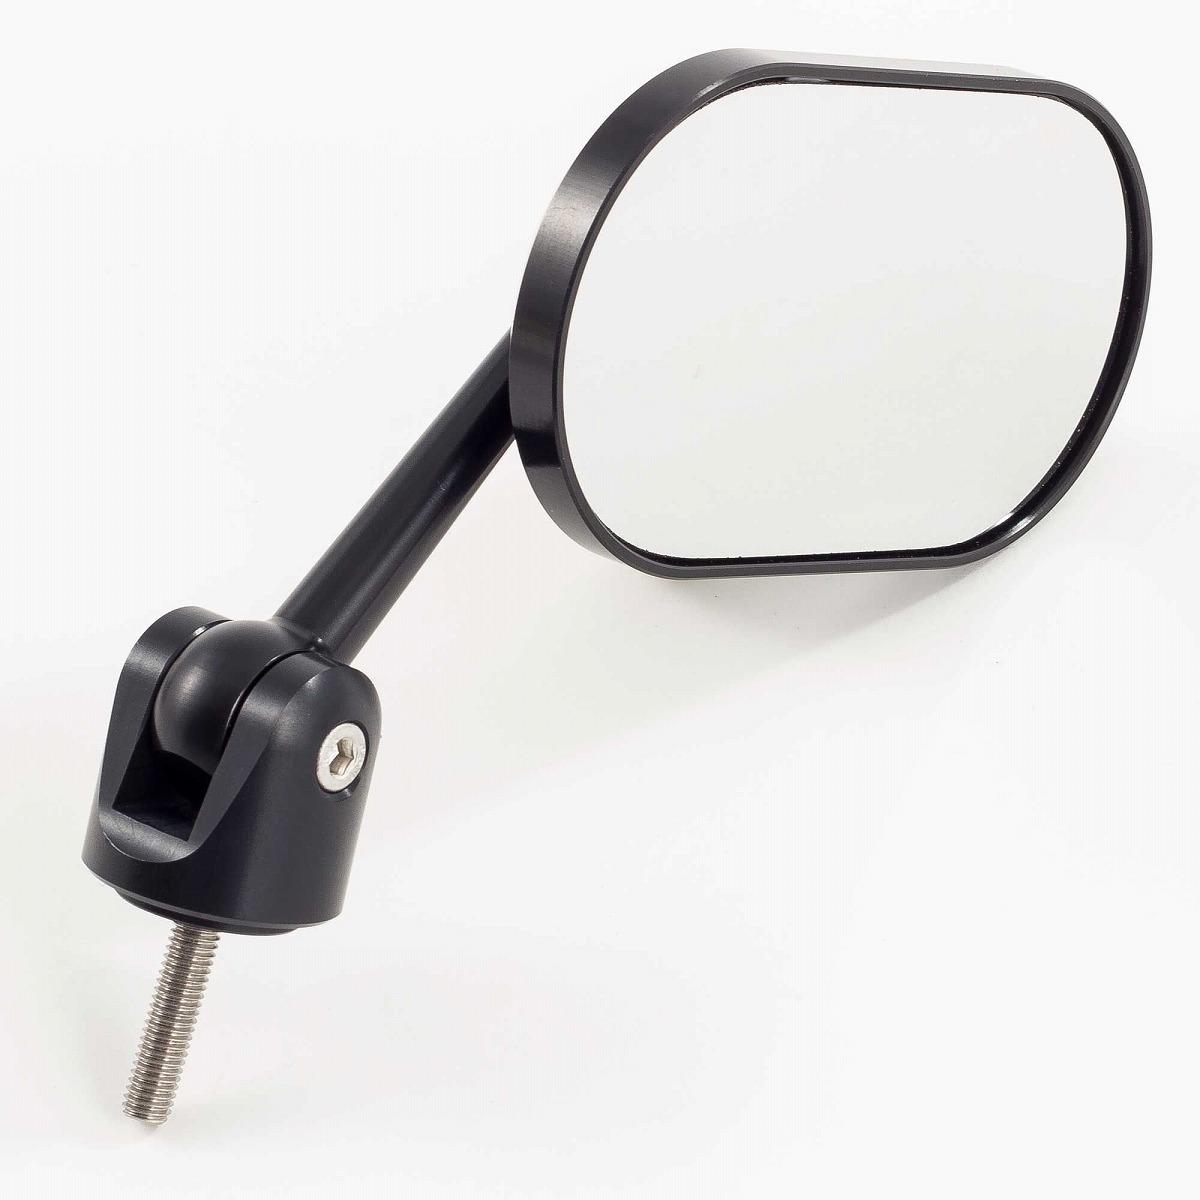 ☆【Oberon】オーベロンフラットオブロン調整可能なバーエンドミラー